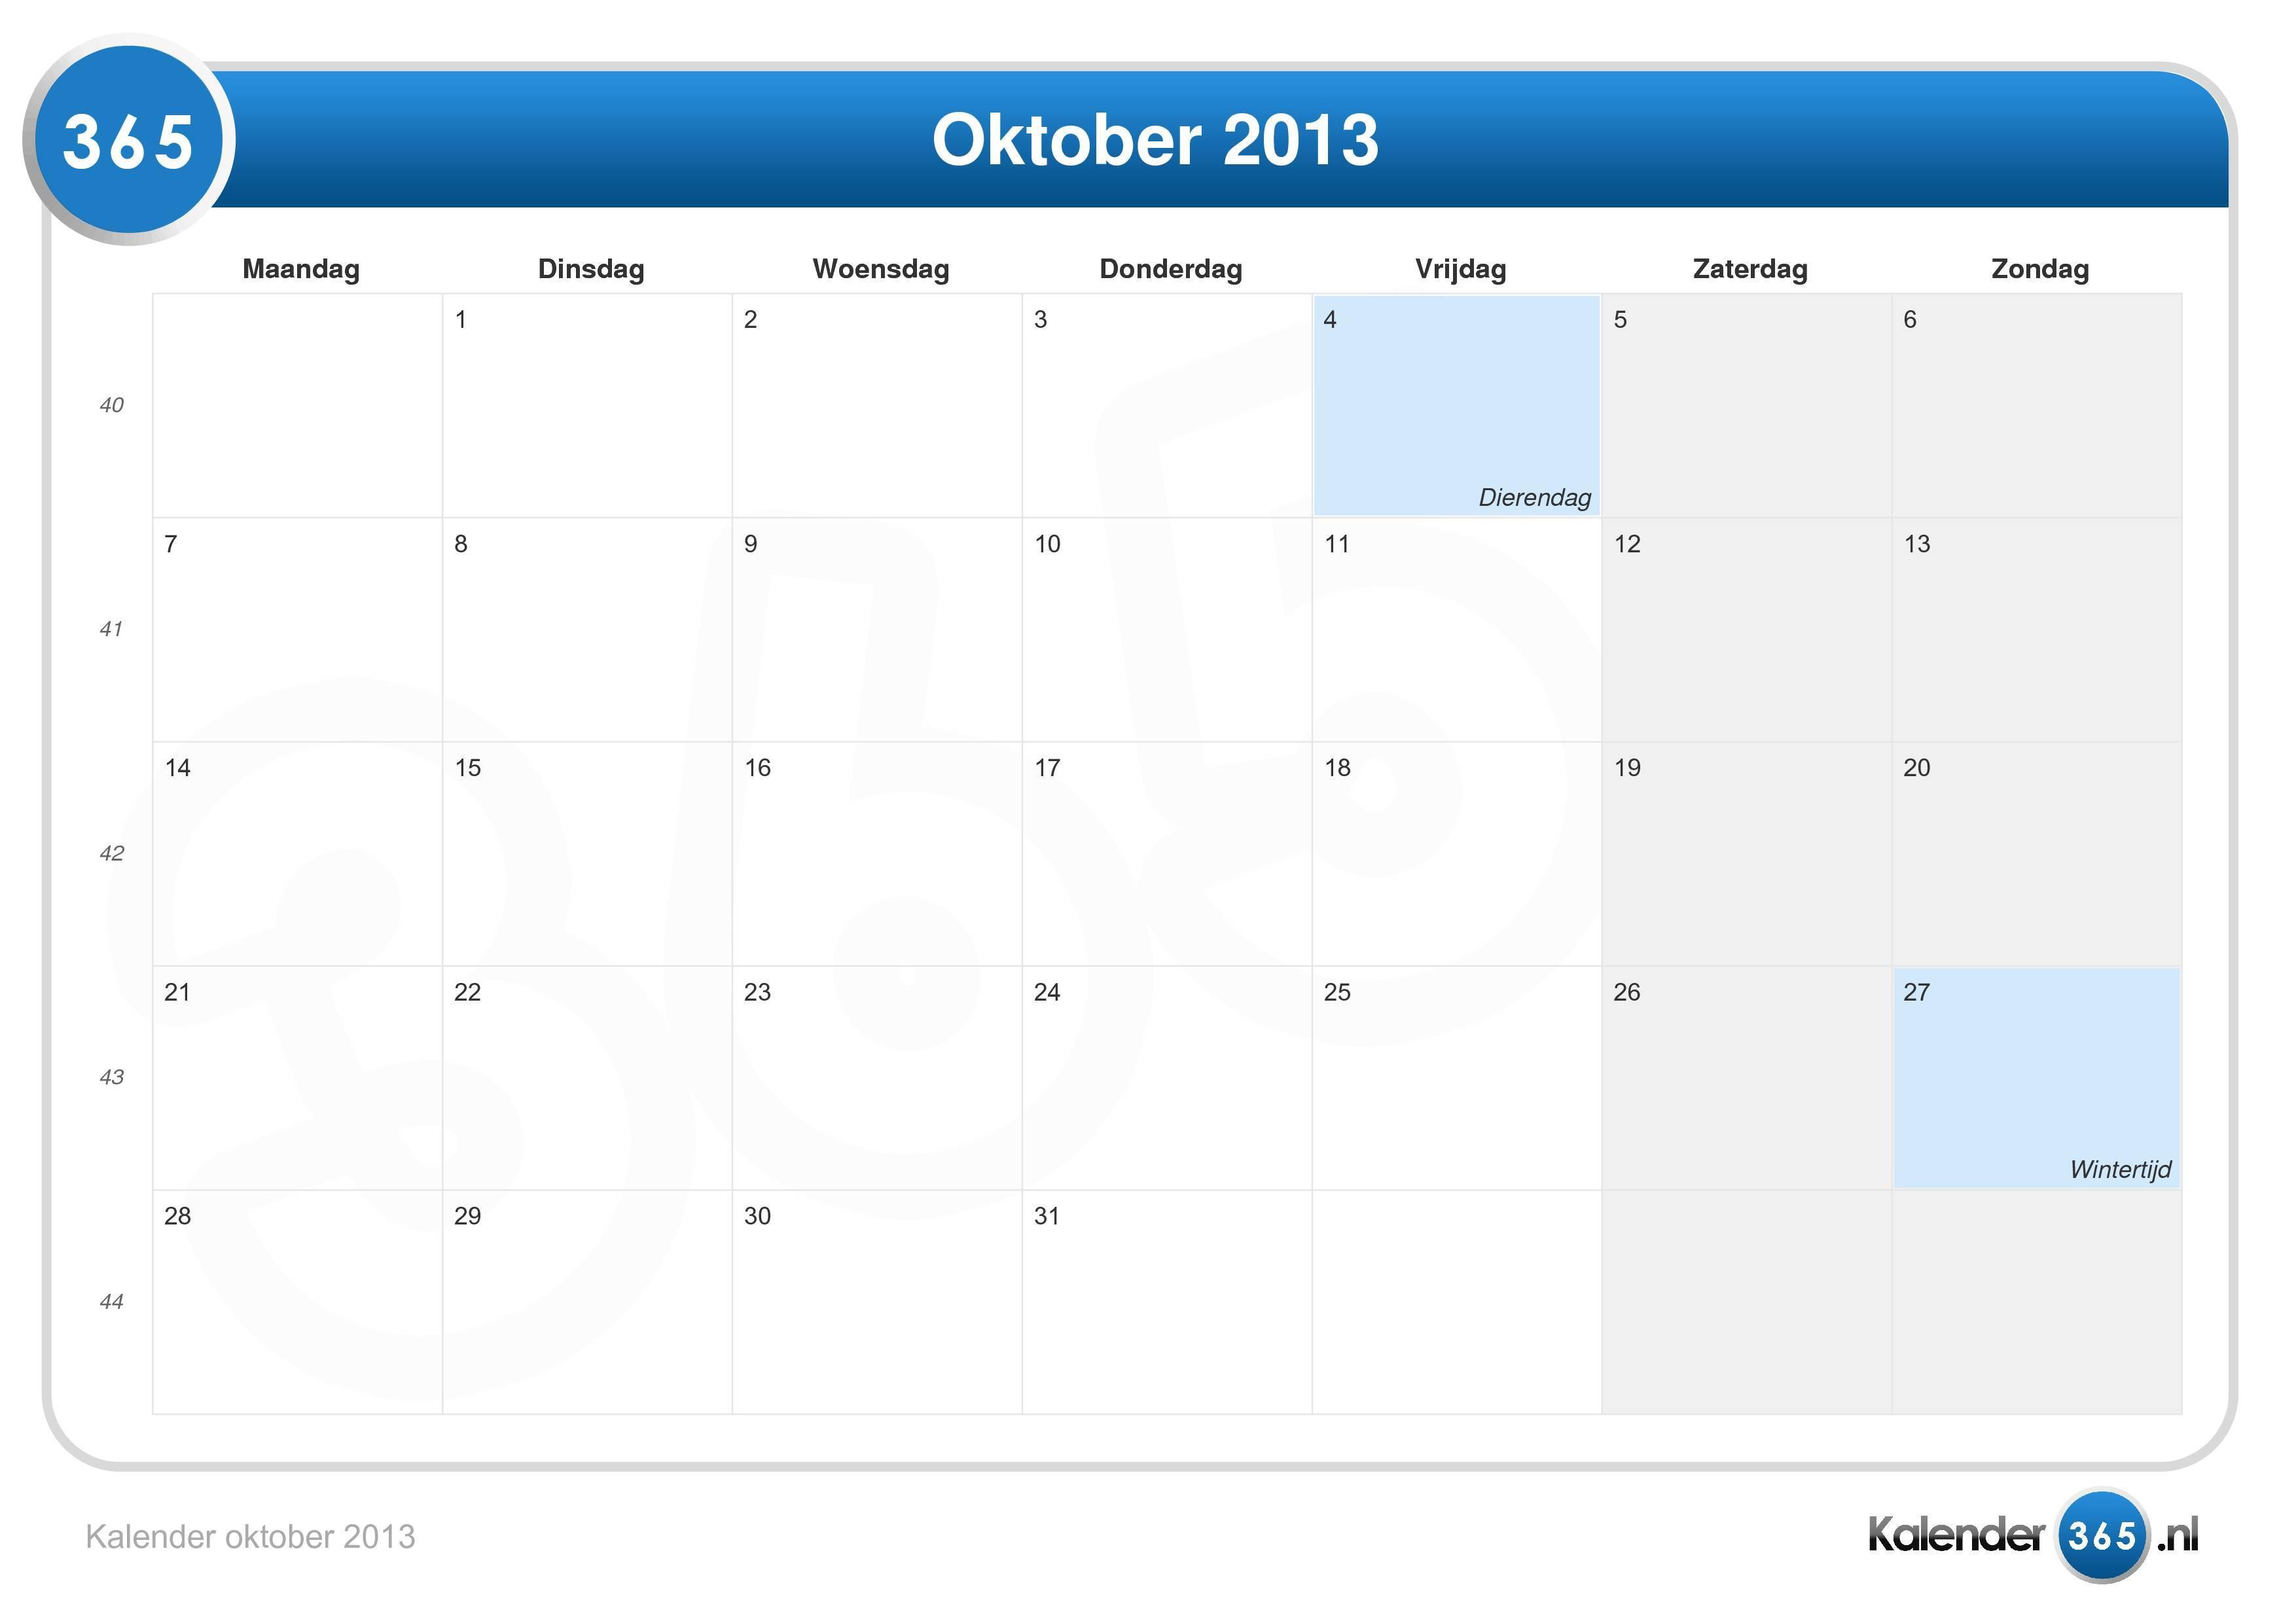 kalender oktober 2013